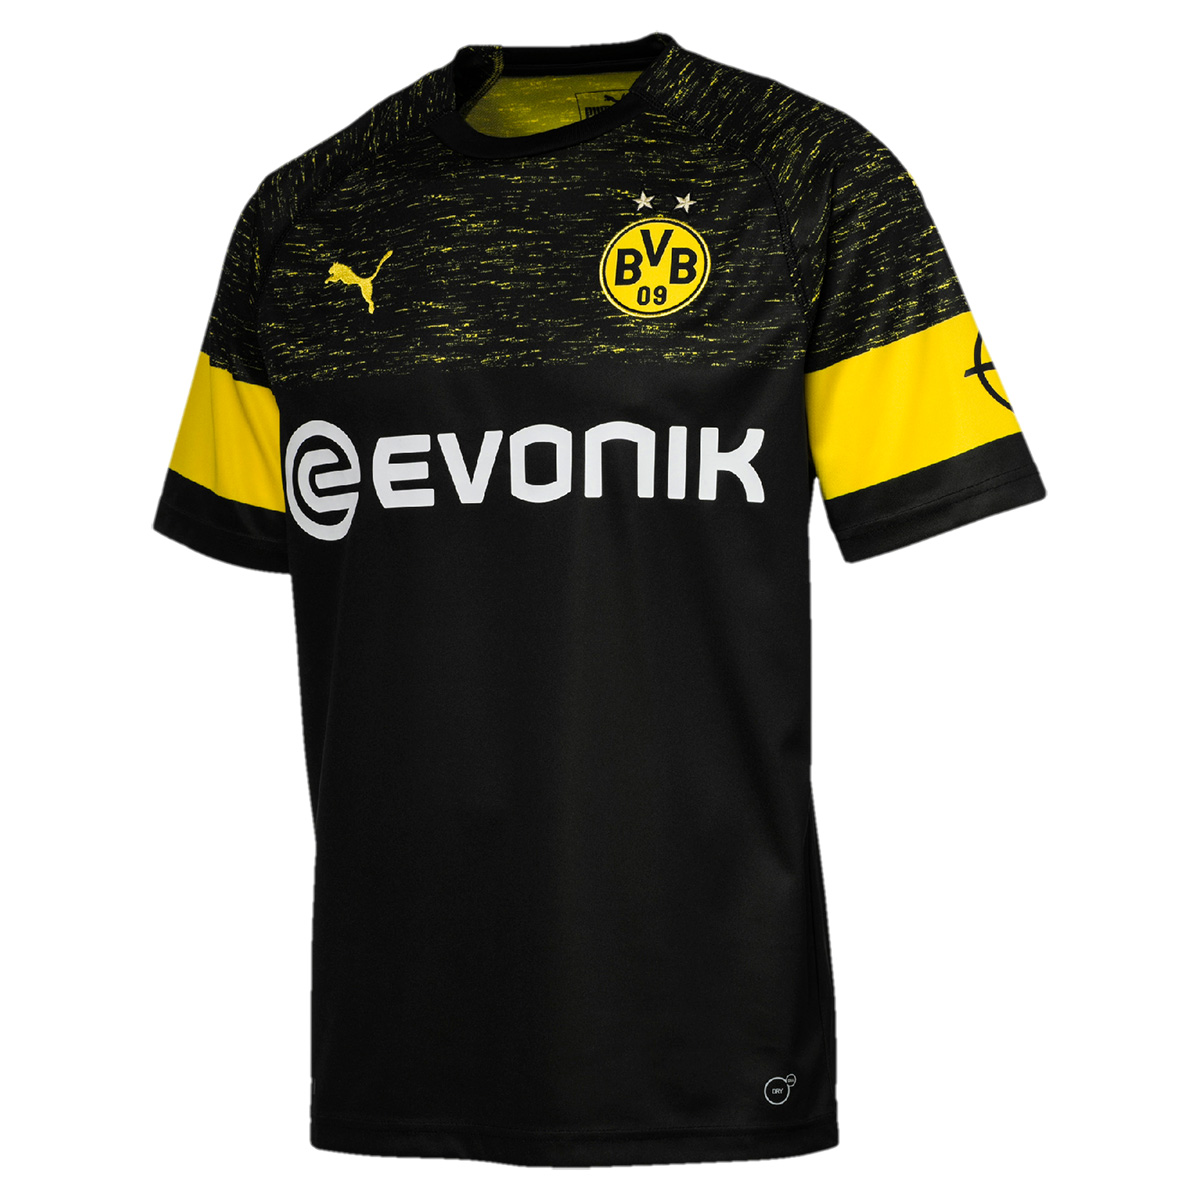 Camisa Puma Borussia Dortmund Away 18 19 s n° - Torcedor Masculina ... d2ae97c7b320c